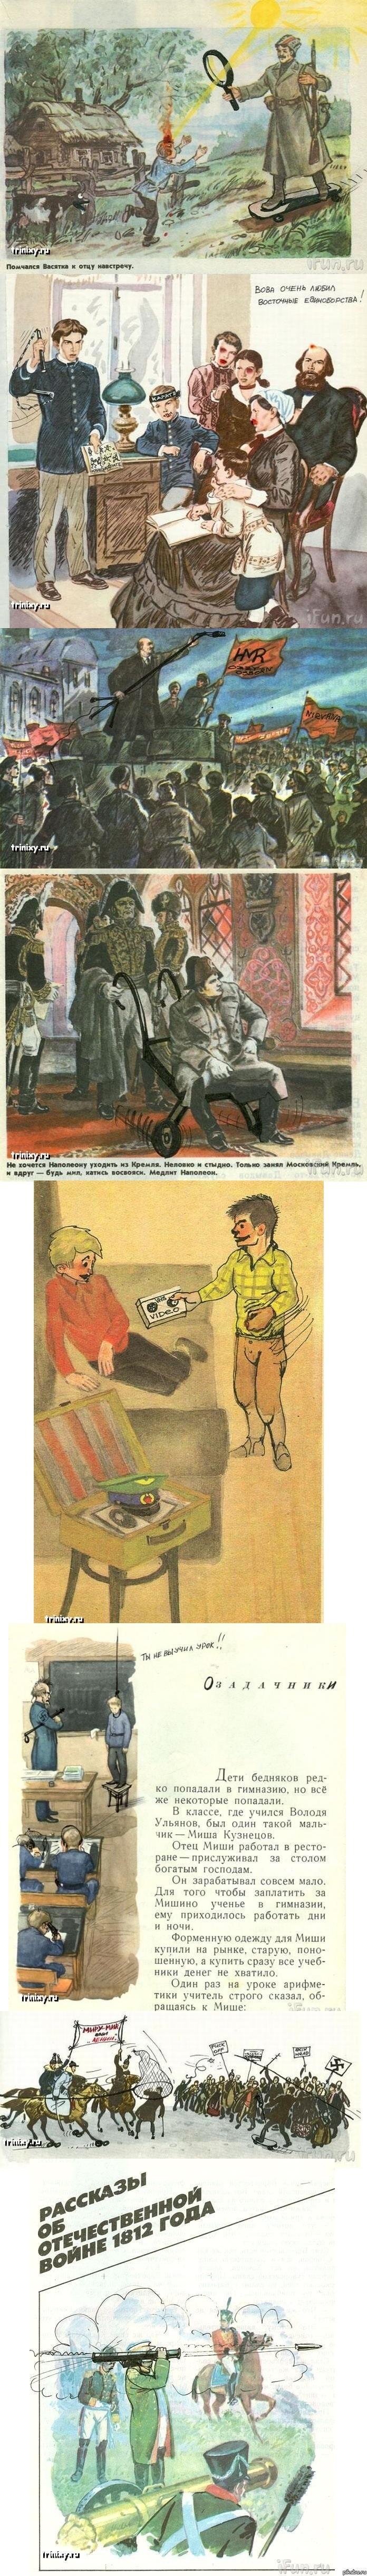 Это были скучнейшие уроки литературы, мы развлекались как могли. Лихое ОБЖ - http://pikabu.ru/story/yeto_byili_likhie_uroki_obzh_myi_razvlekalis_kak_mogli_v30_869844